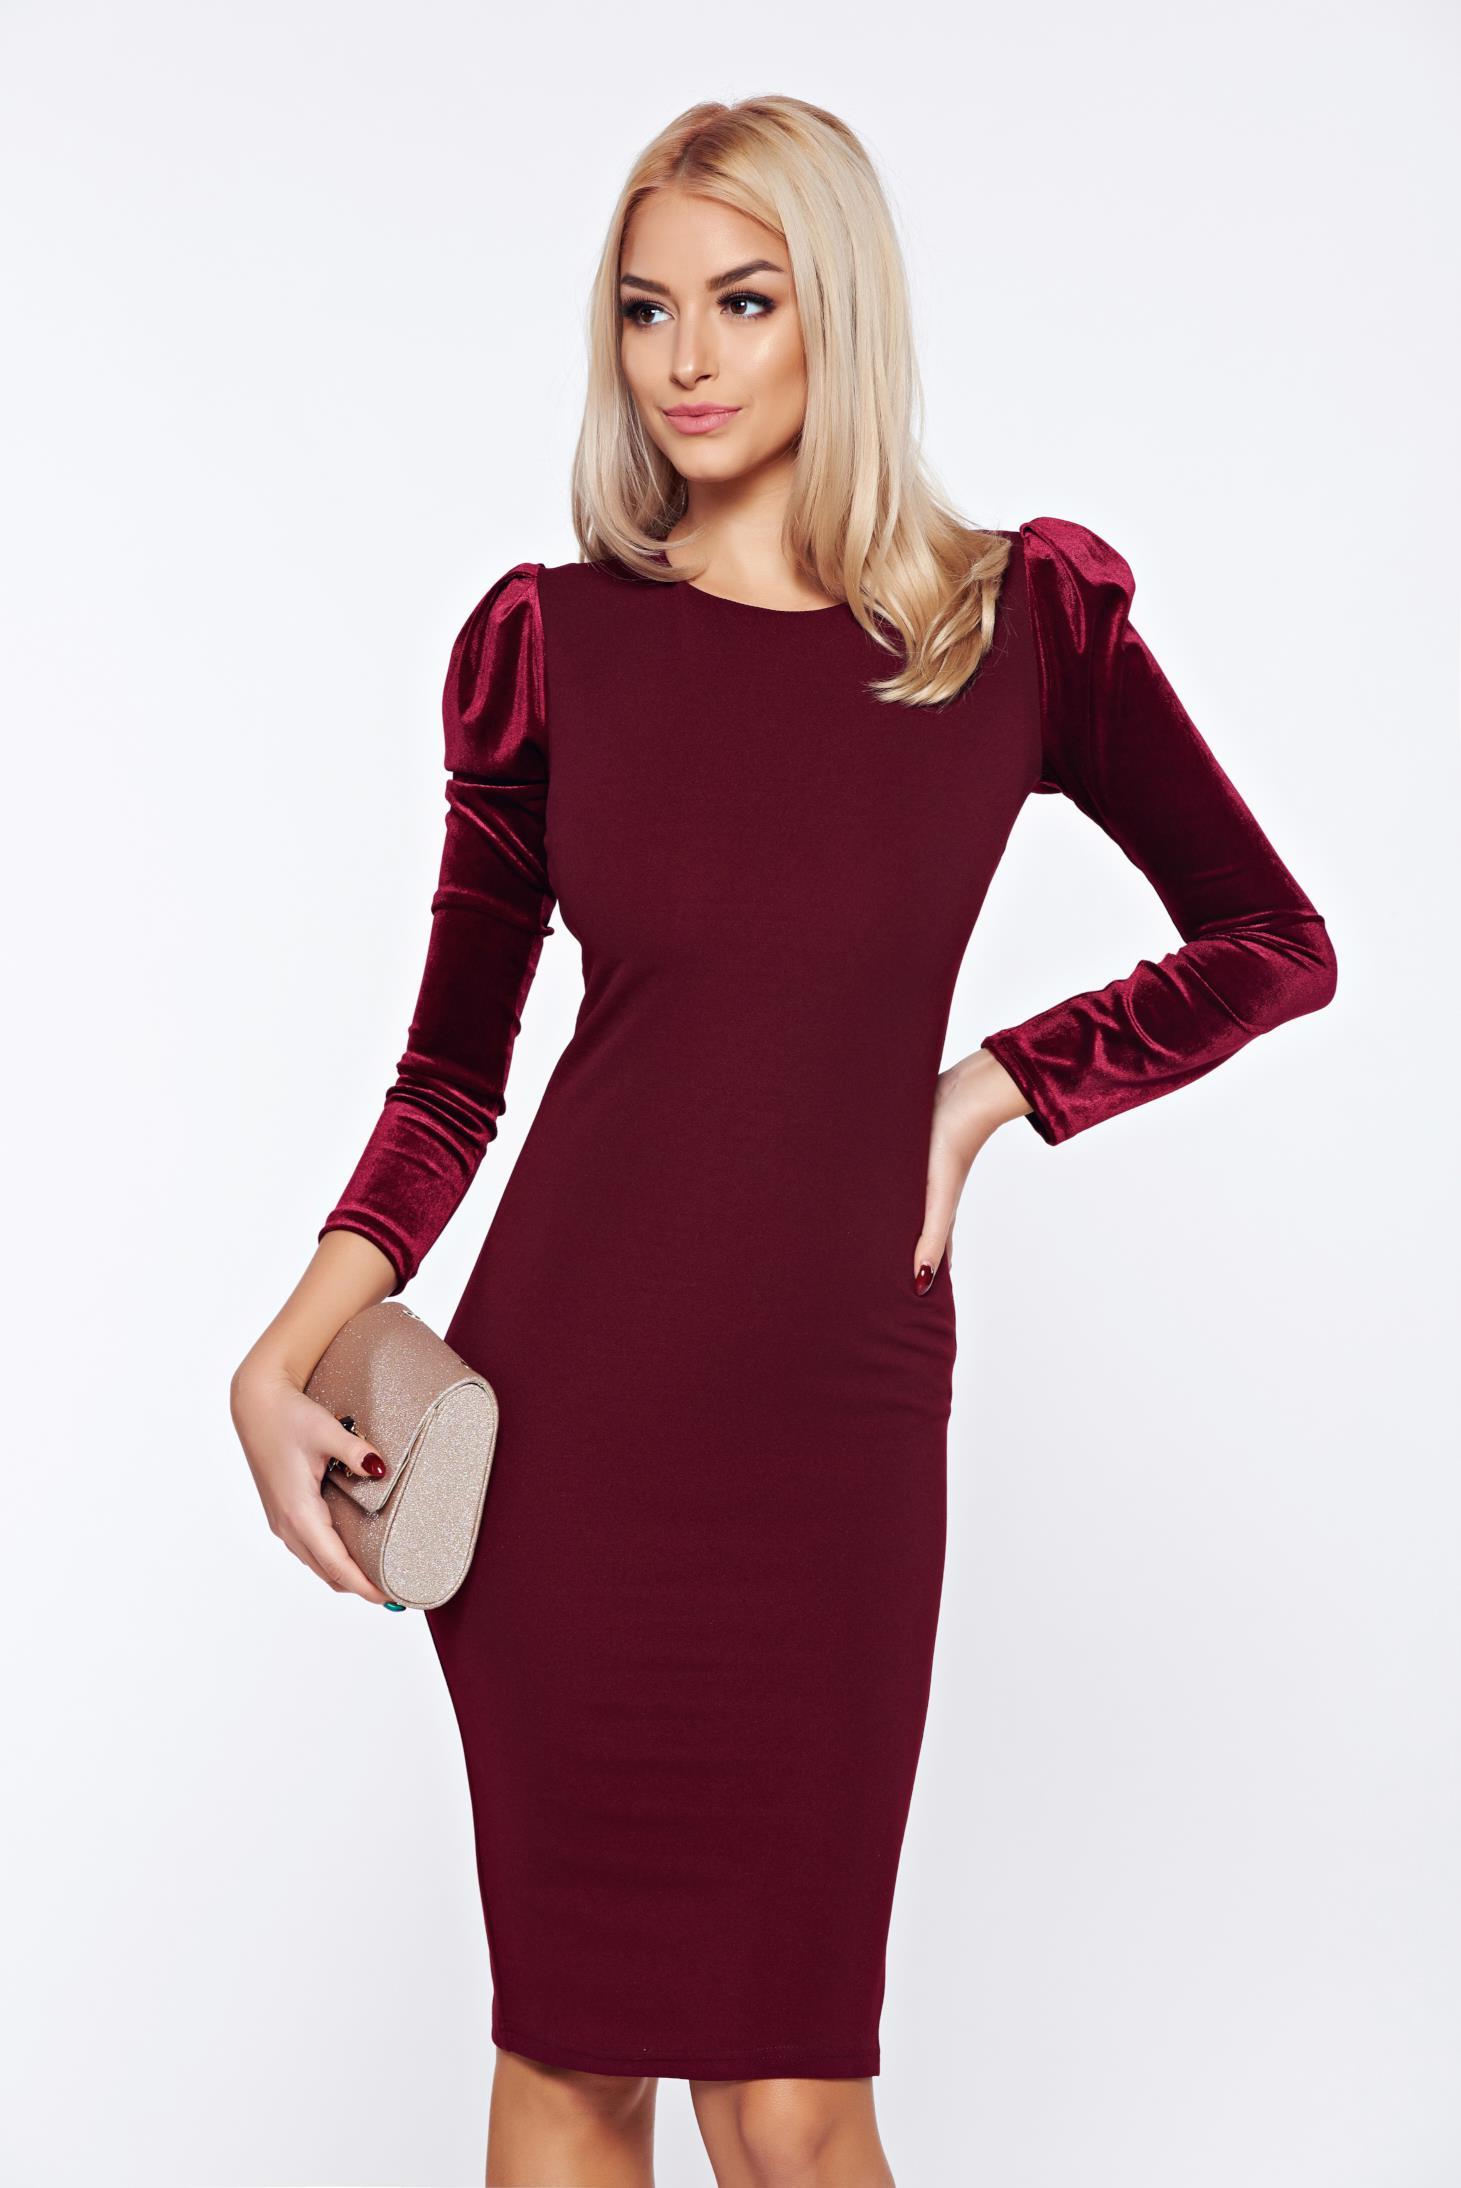 a79ac4a984610 artista-burgundy-elegant-pencil-dress-from-velvet--S032699-2-318176.jpg